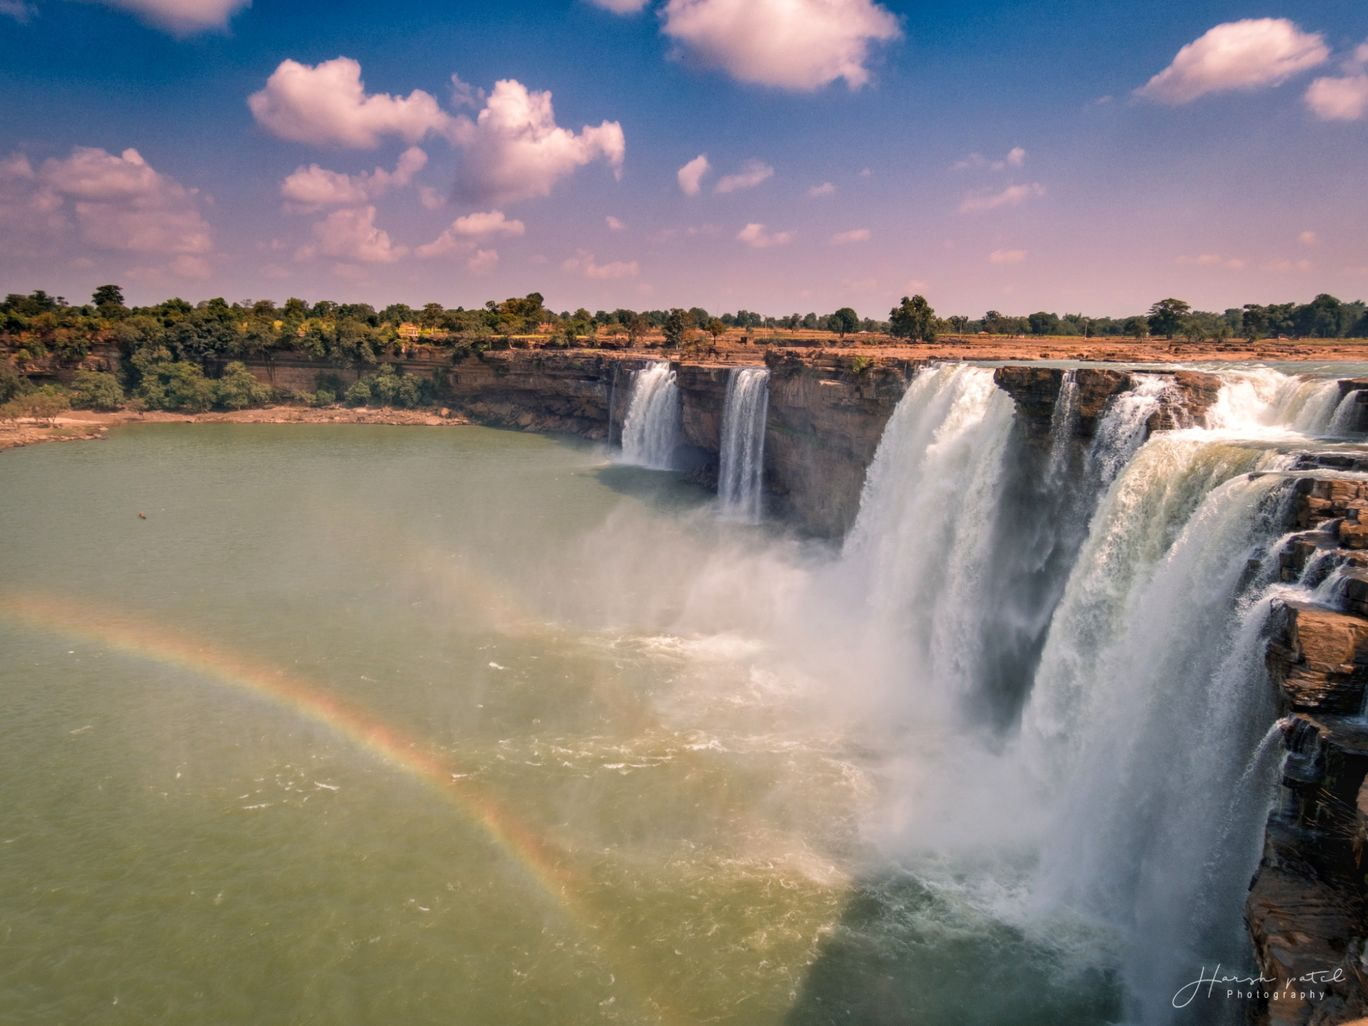 Photo of Chitrakot Falls By Harsh Patel